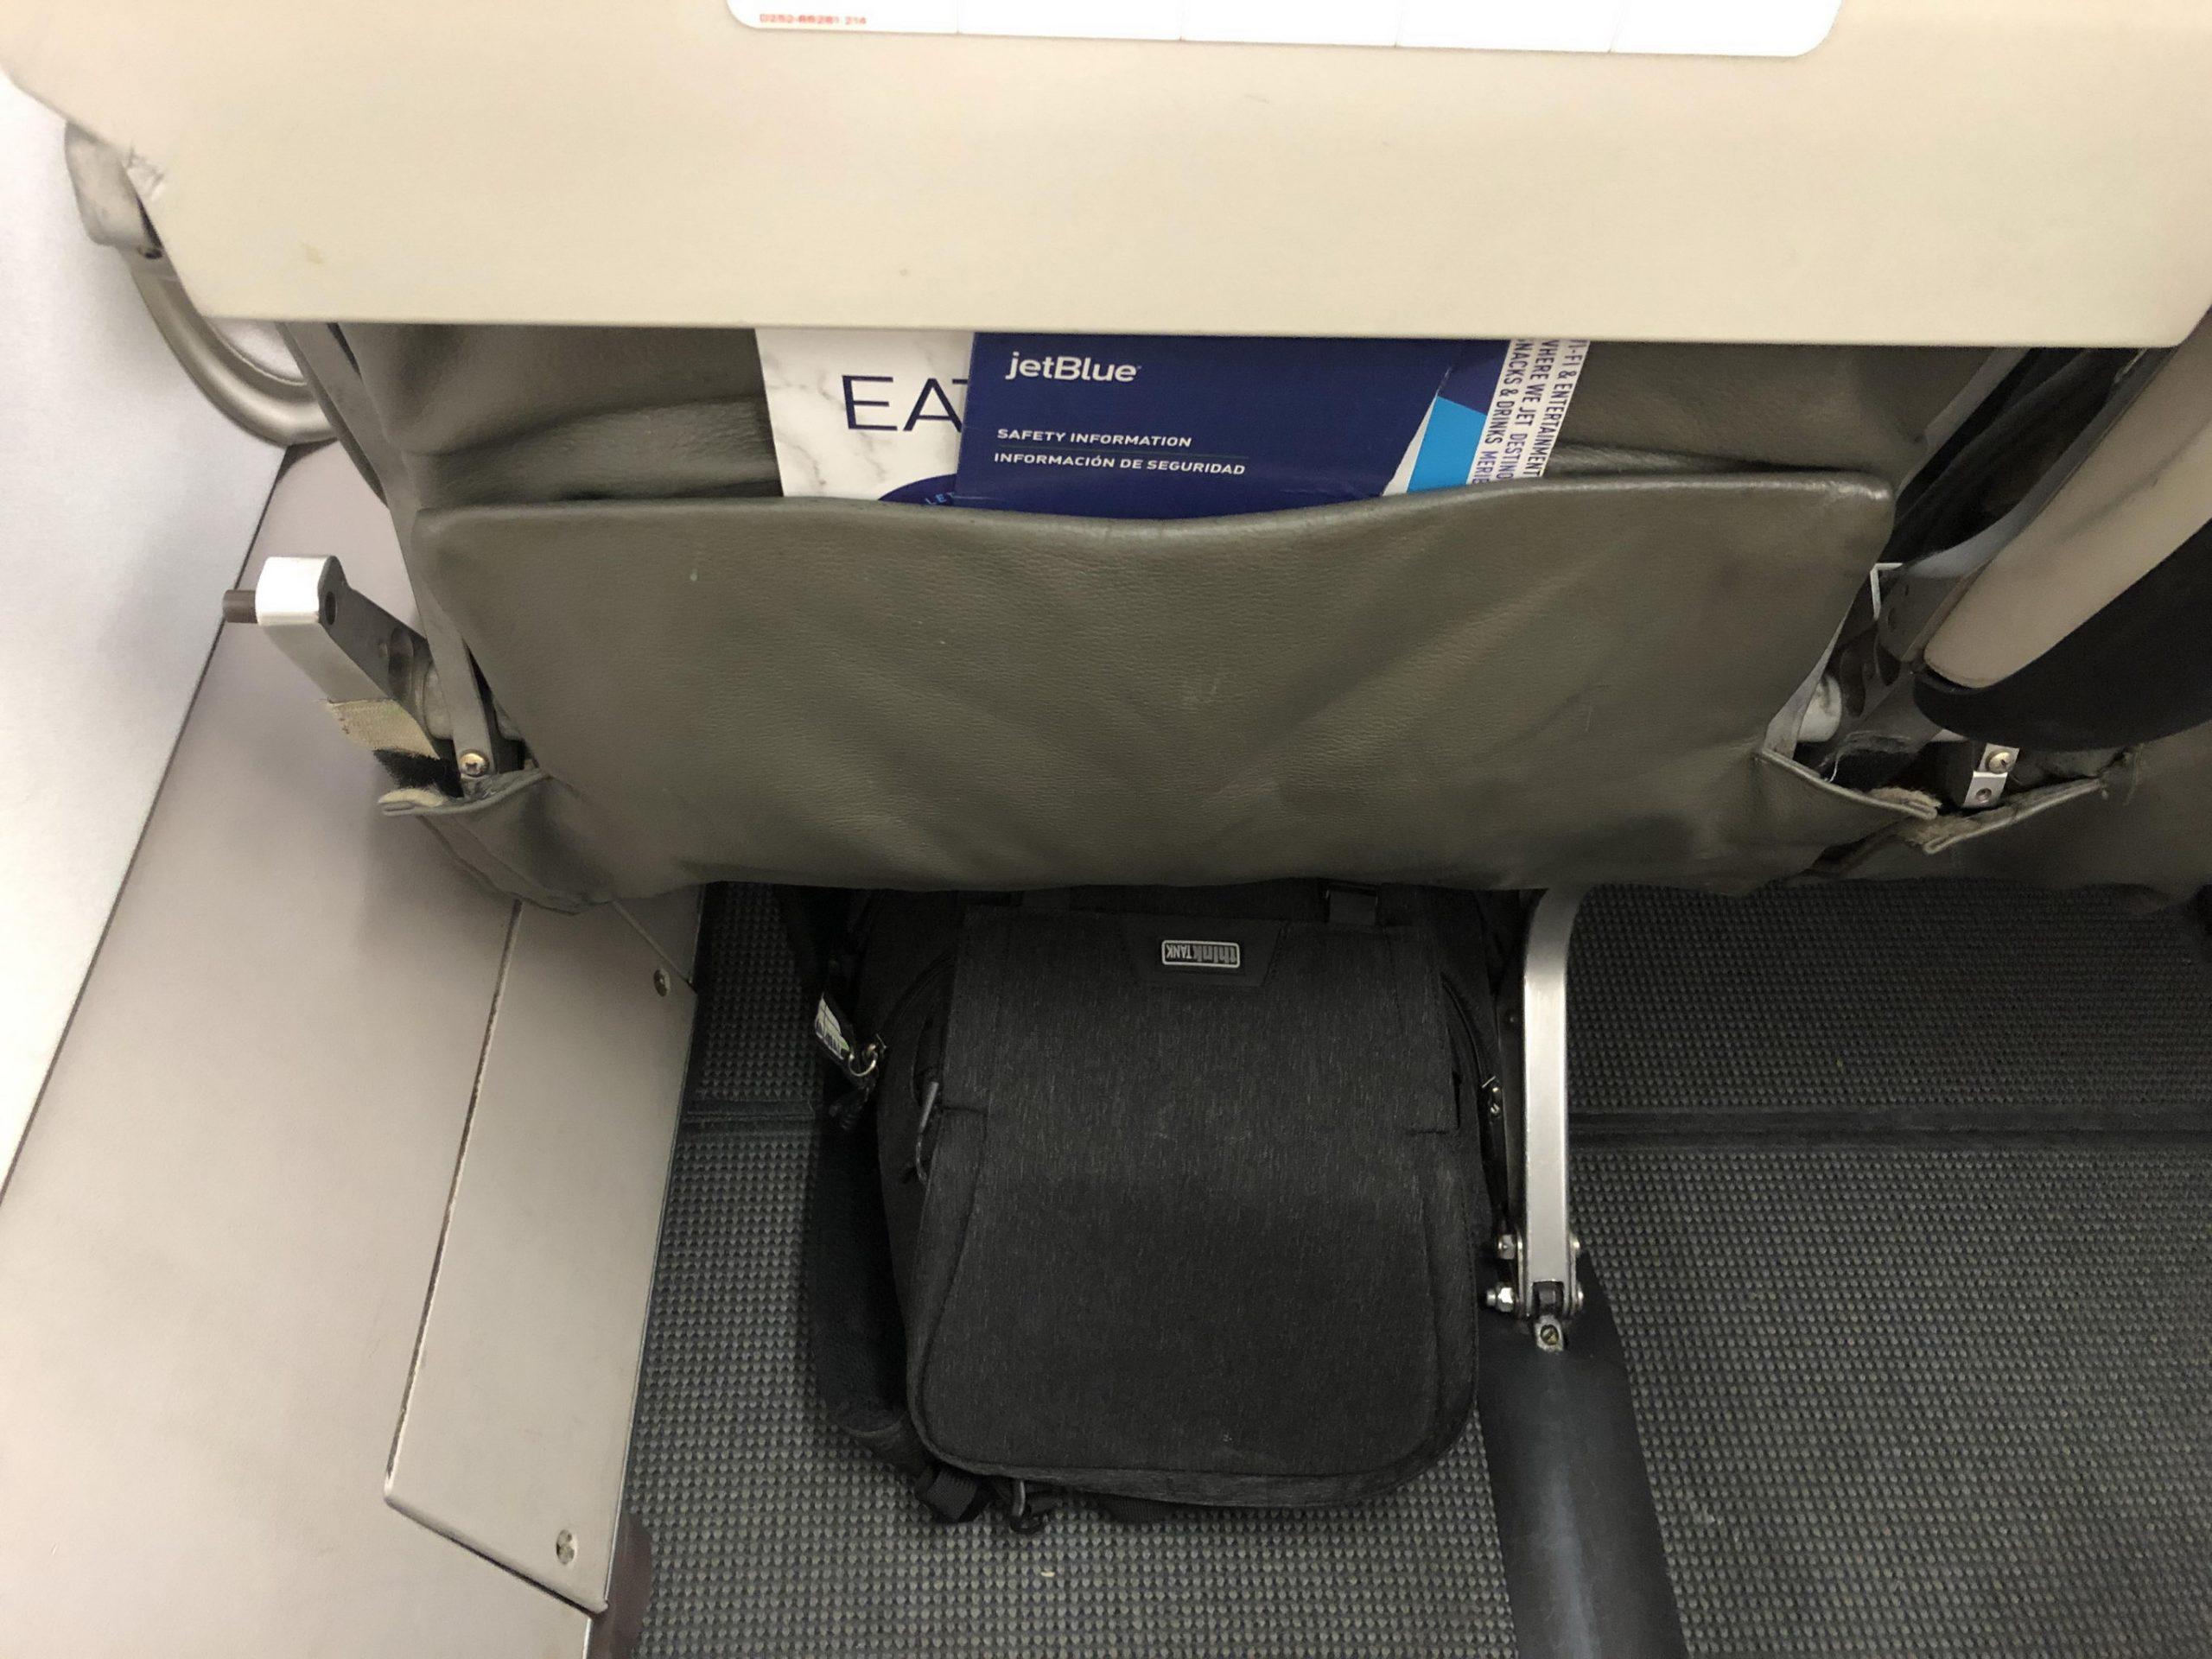 Urban Access 15 on a Jetblue Airbus A320